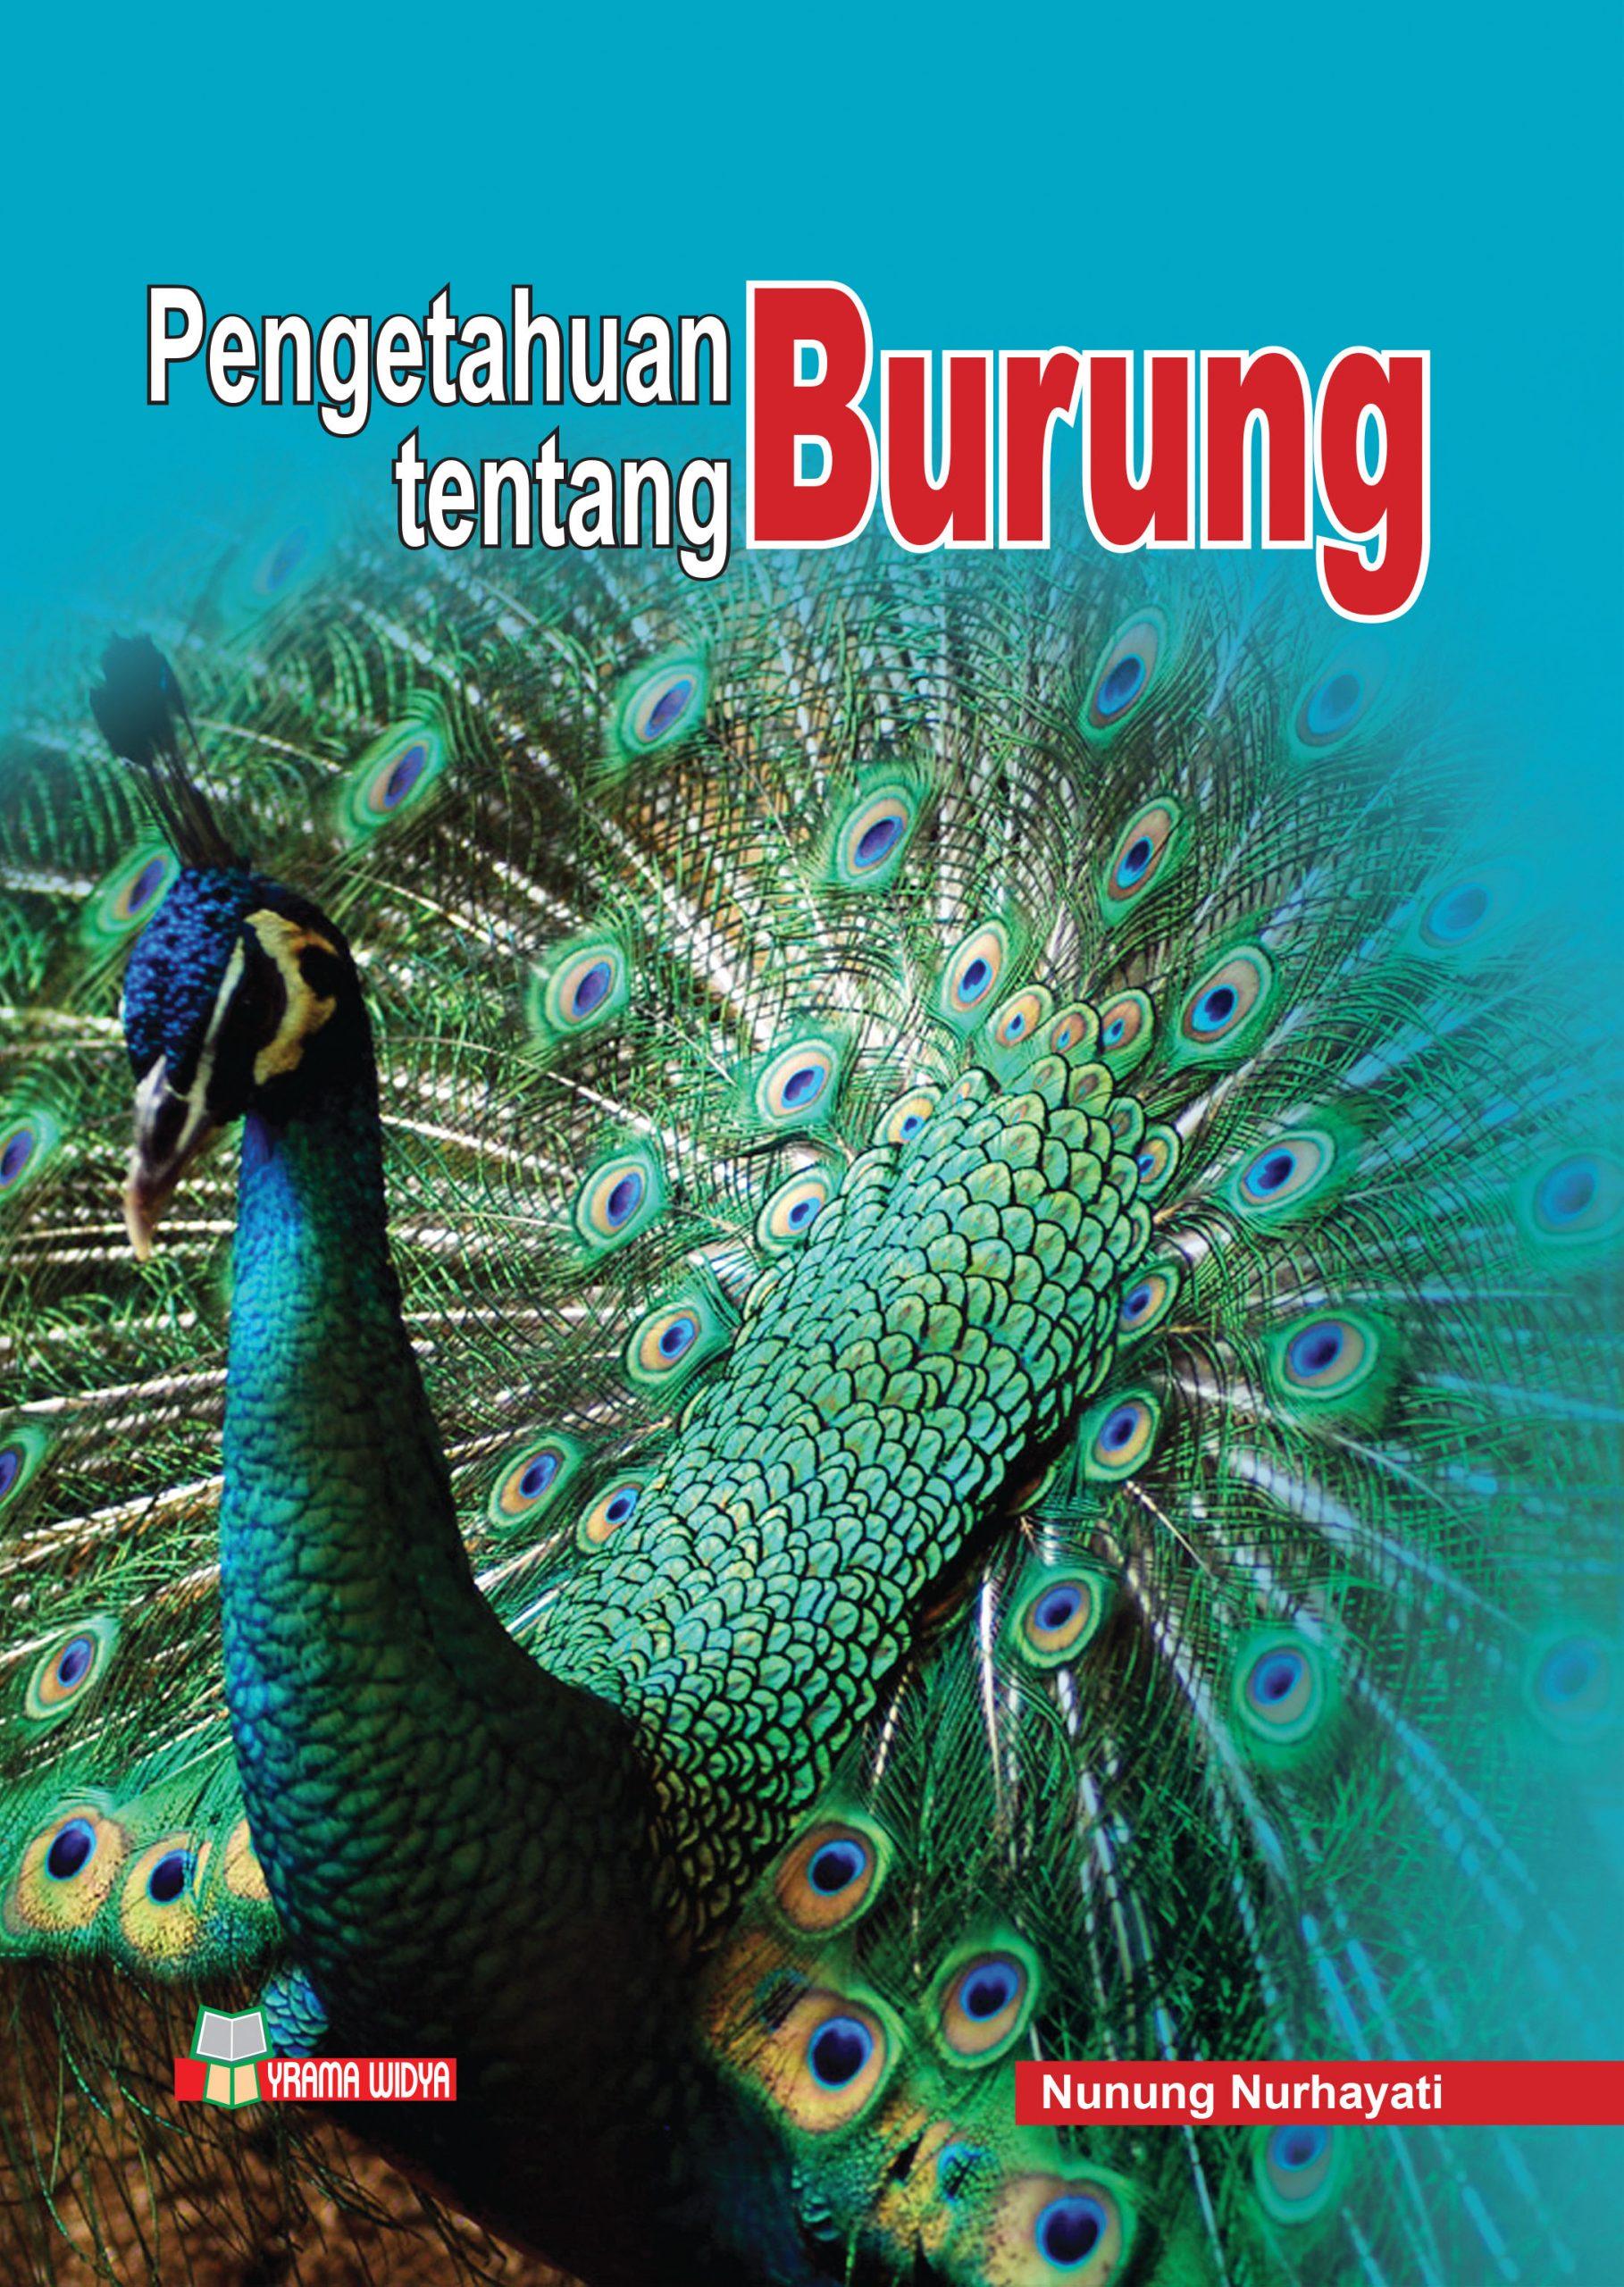 buku pengetahuan tentang burung